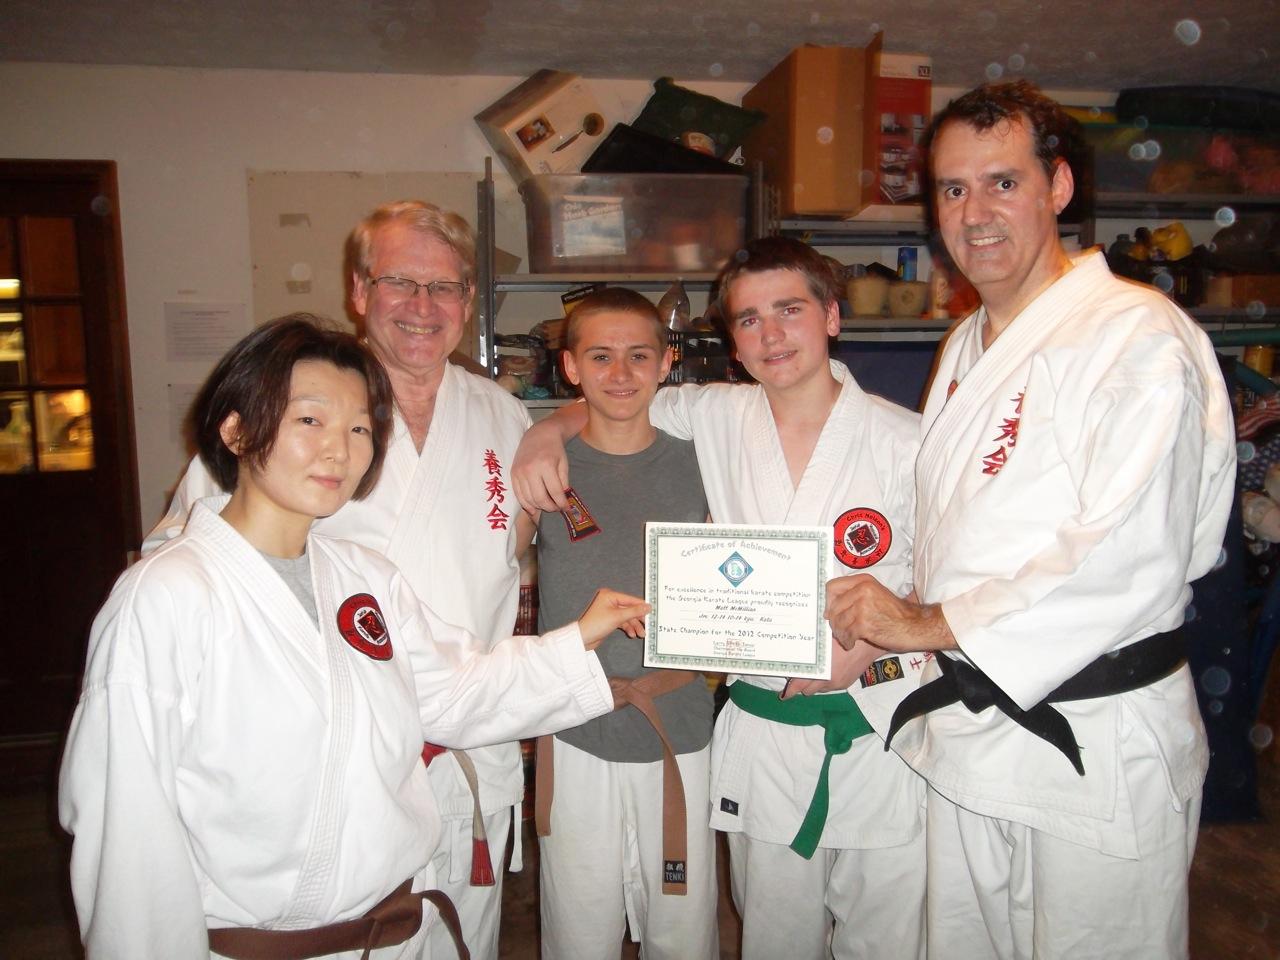 Matt awarded 2012 state champion